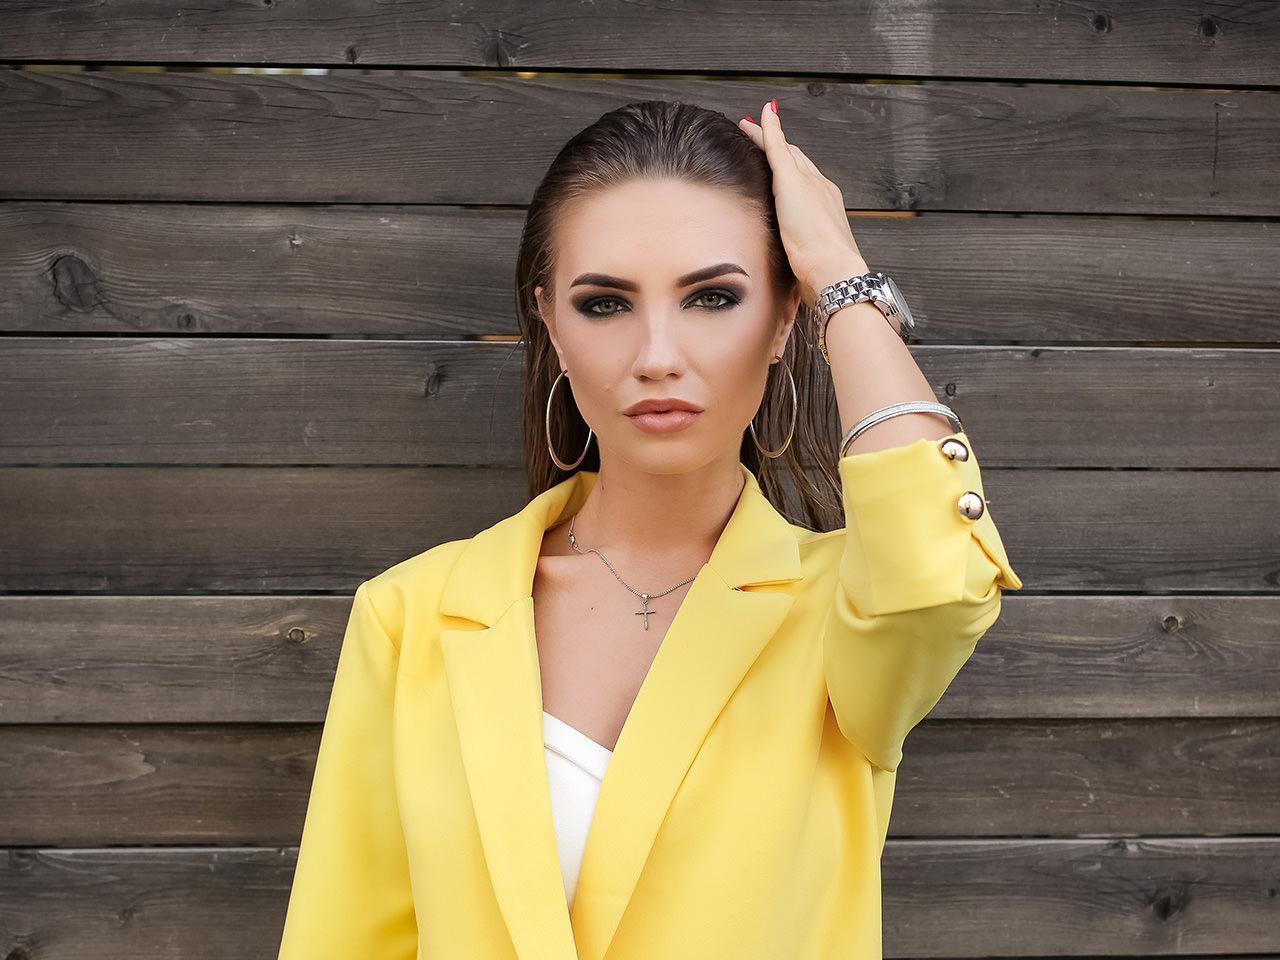 Svetlana Afanaseva